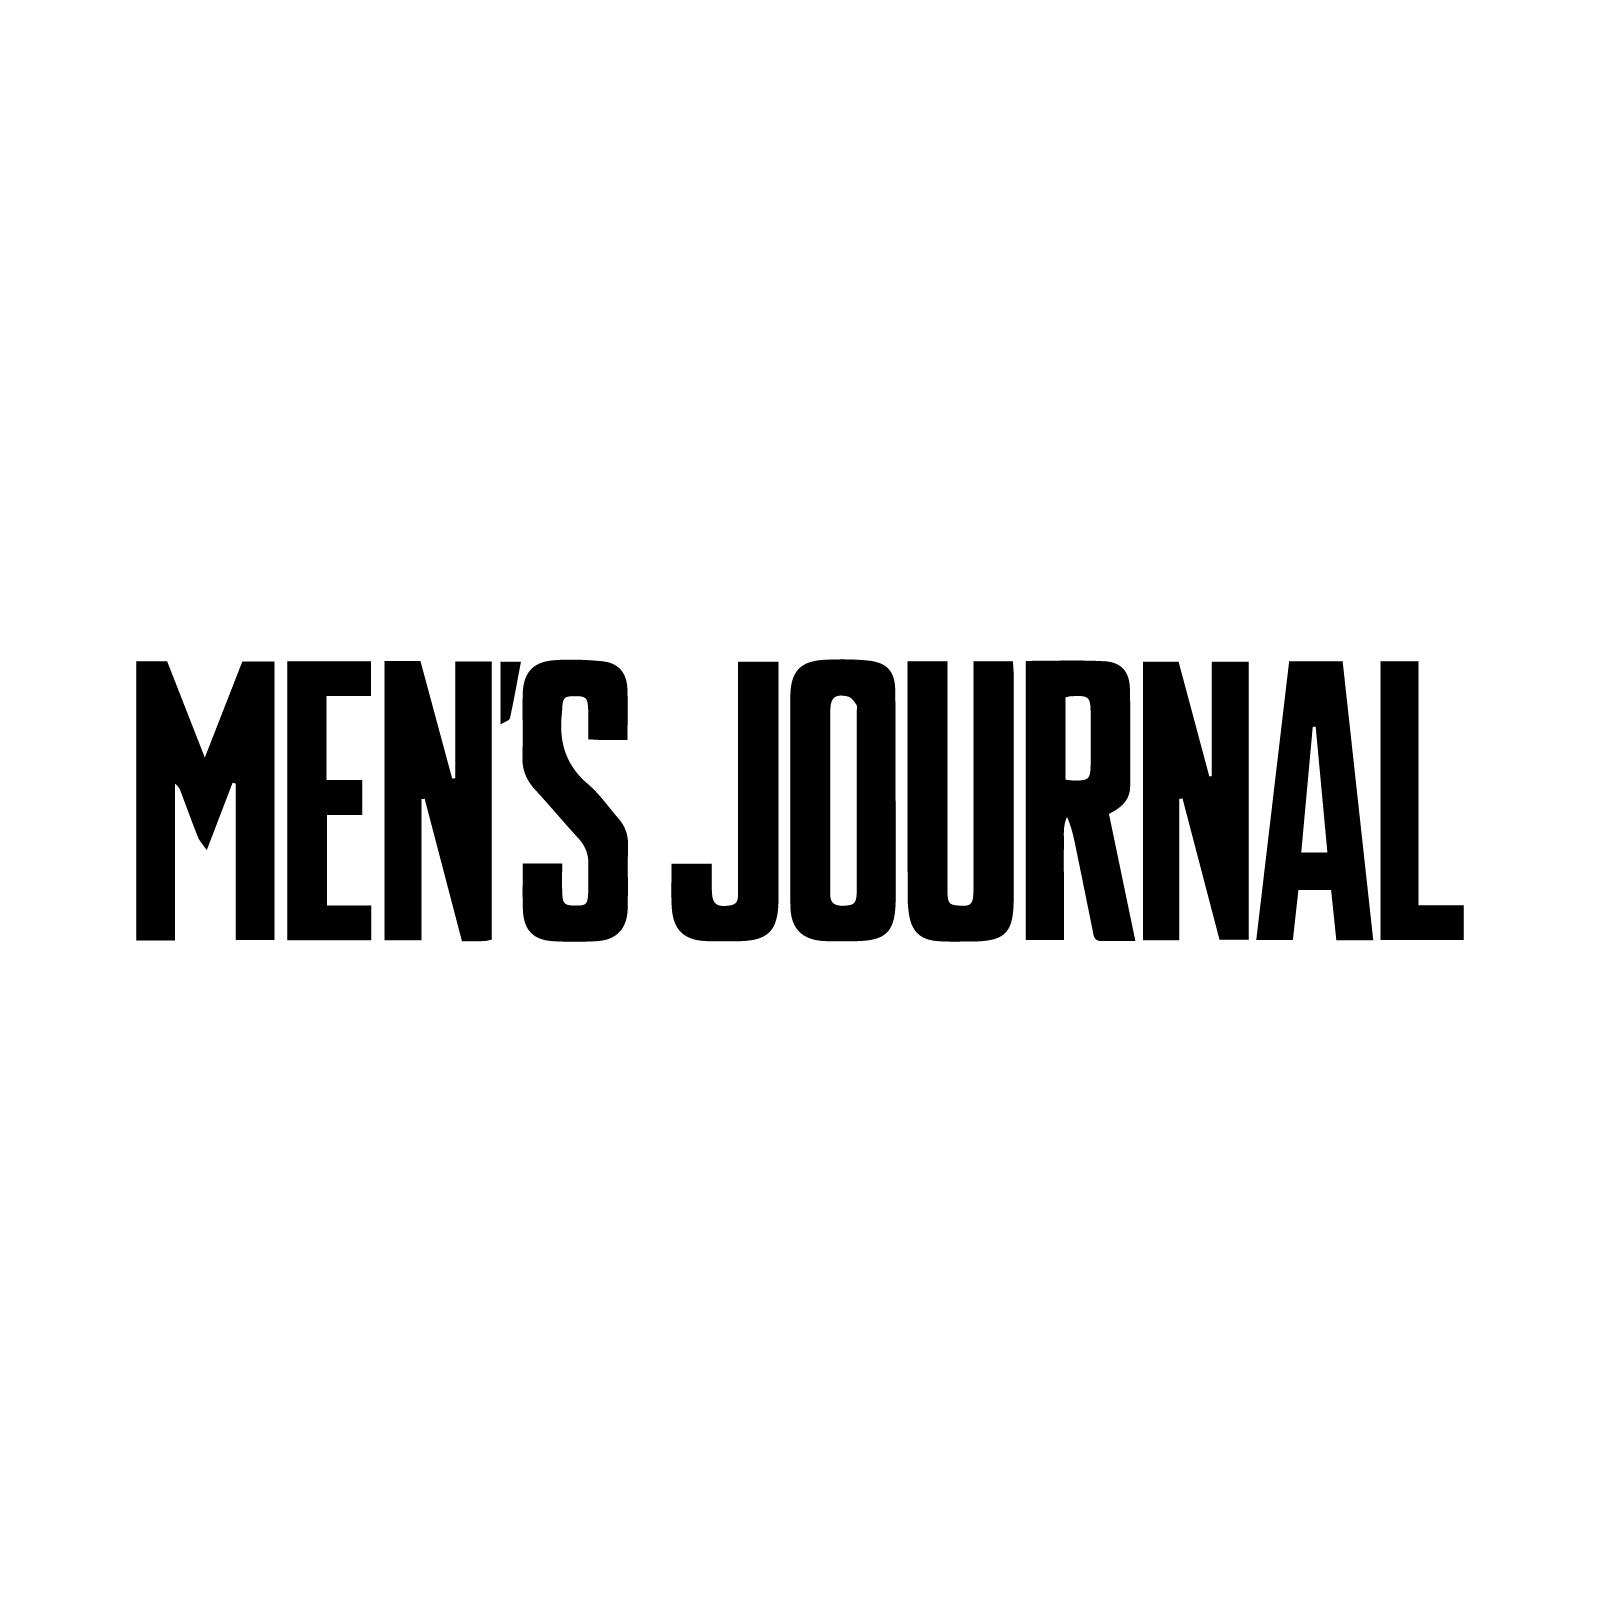 Press Logos_Men's Journal.png